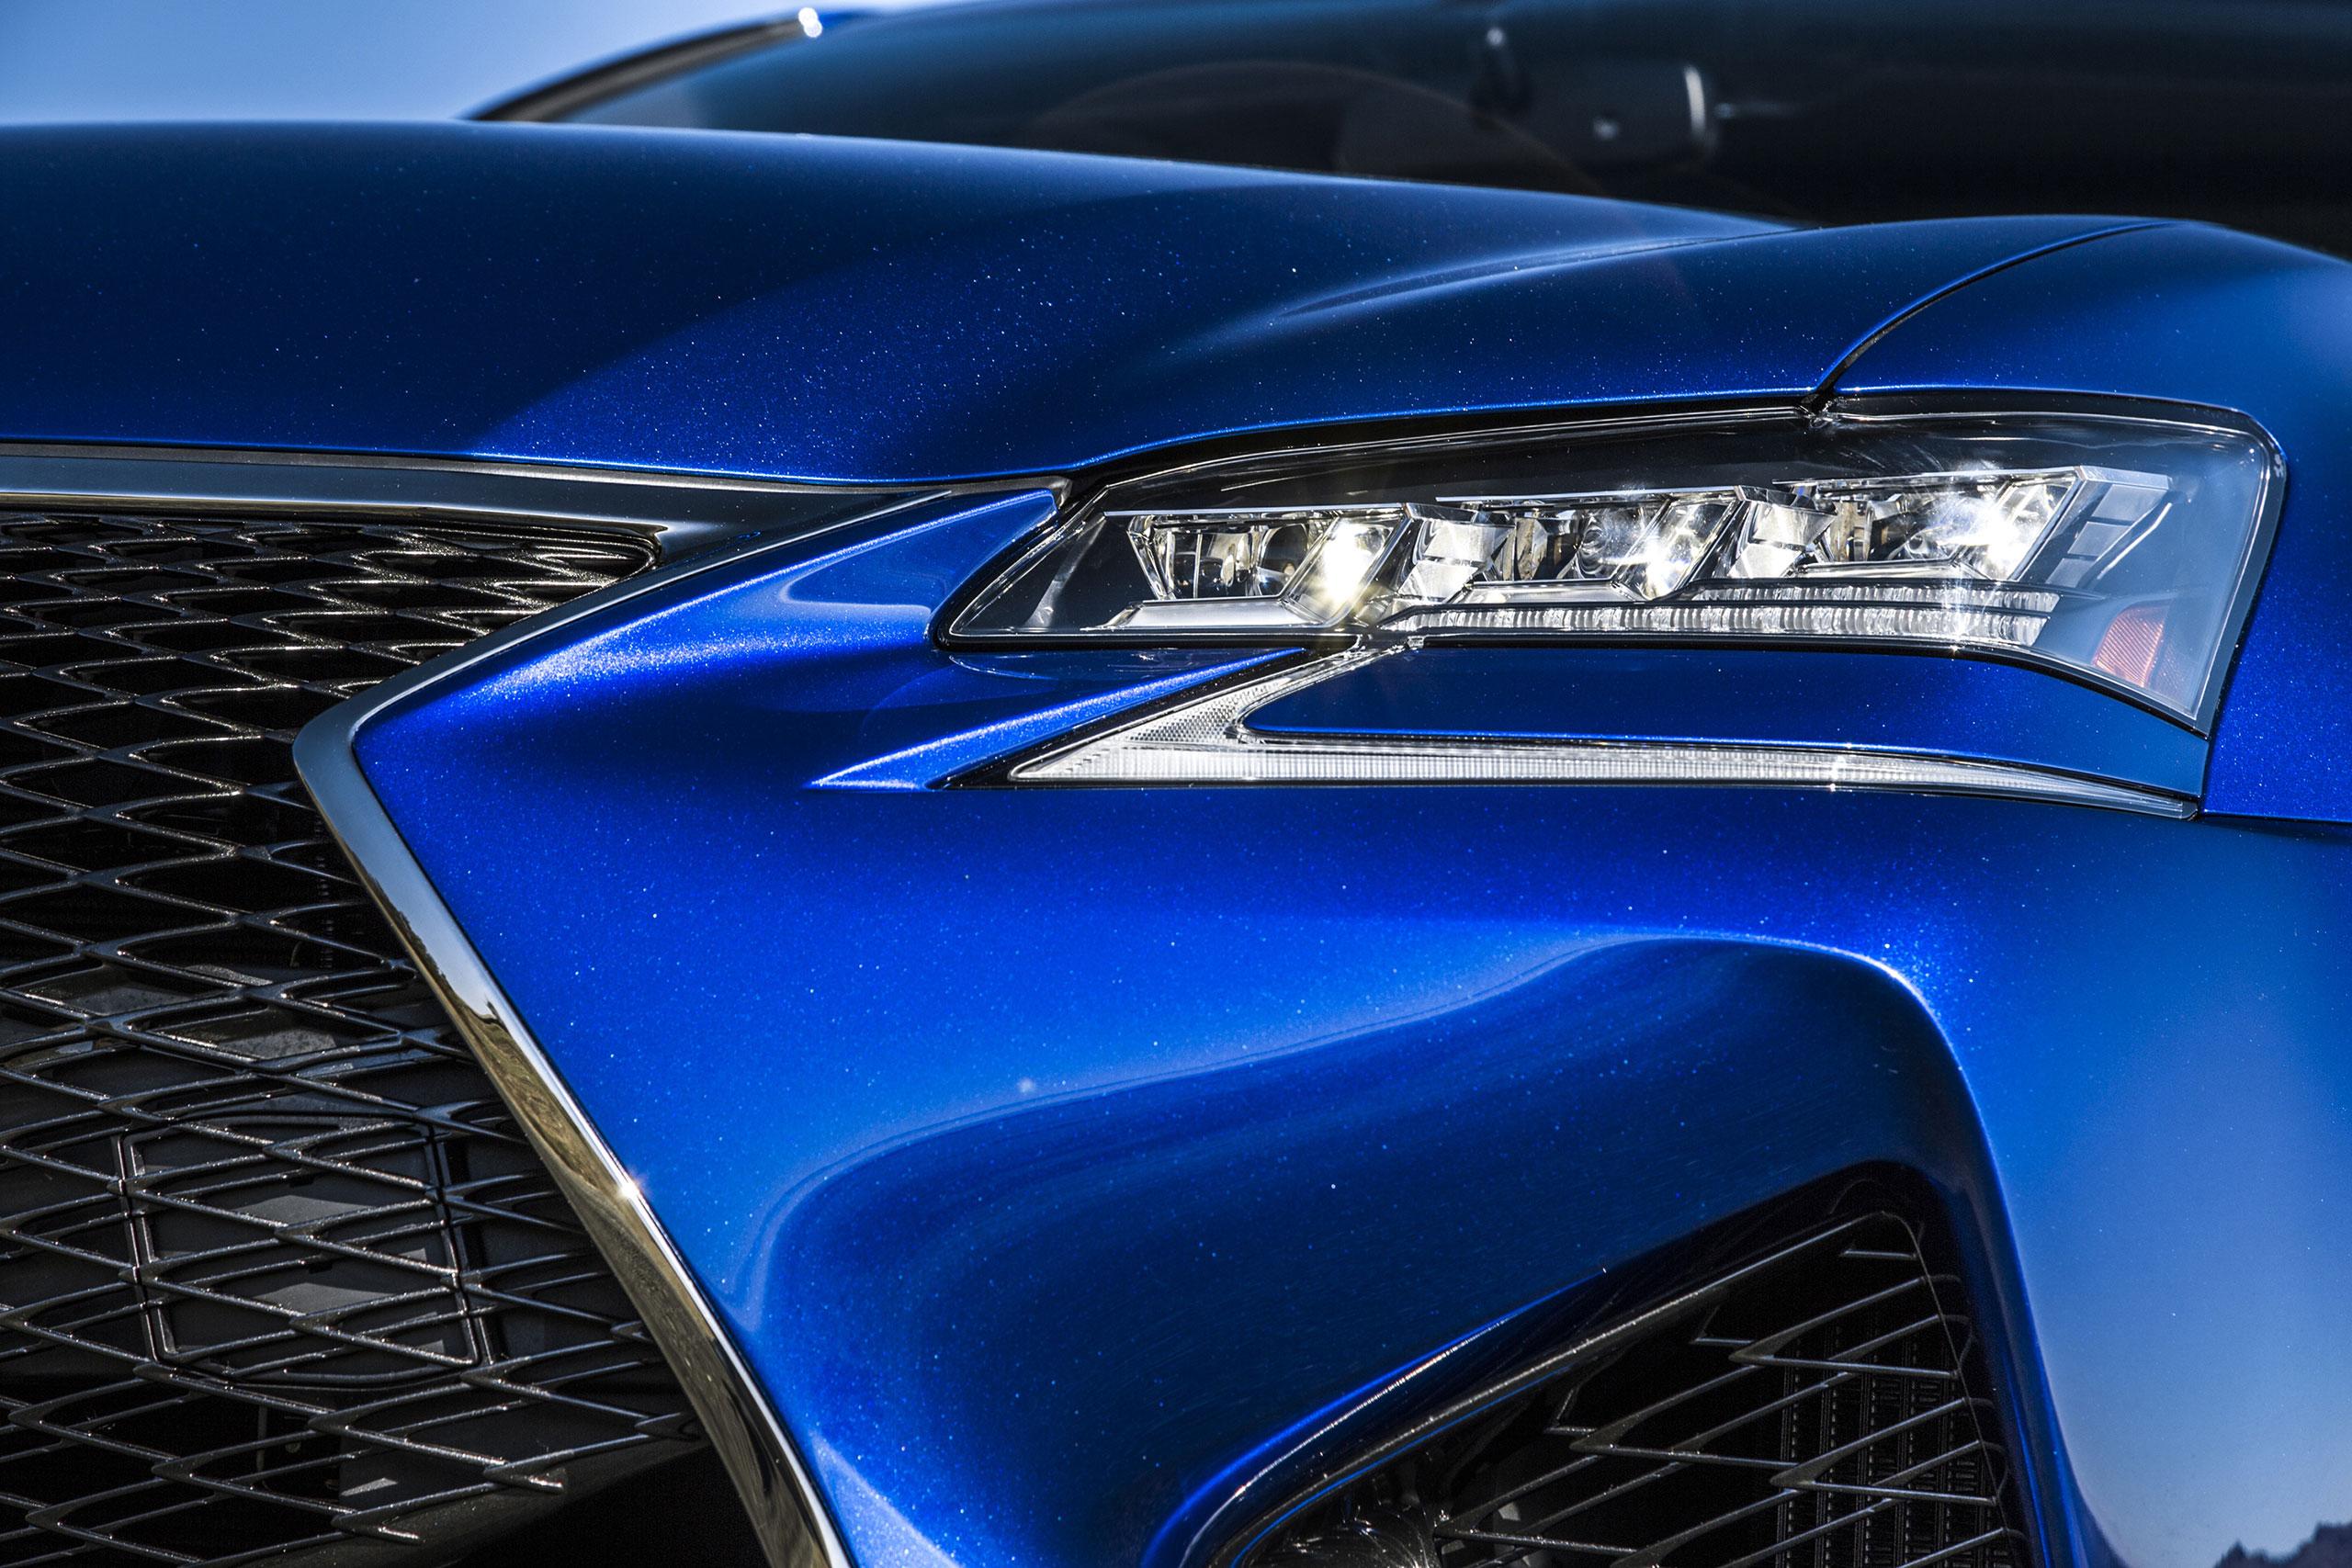 2011 lexus gx 460 review new cars car reviews car html autos weblog. Black Bedroom Furniture Sets. Home Design Ideas